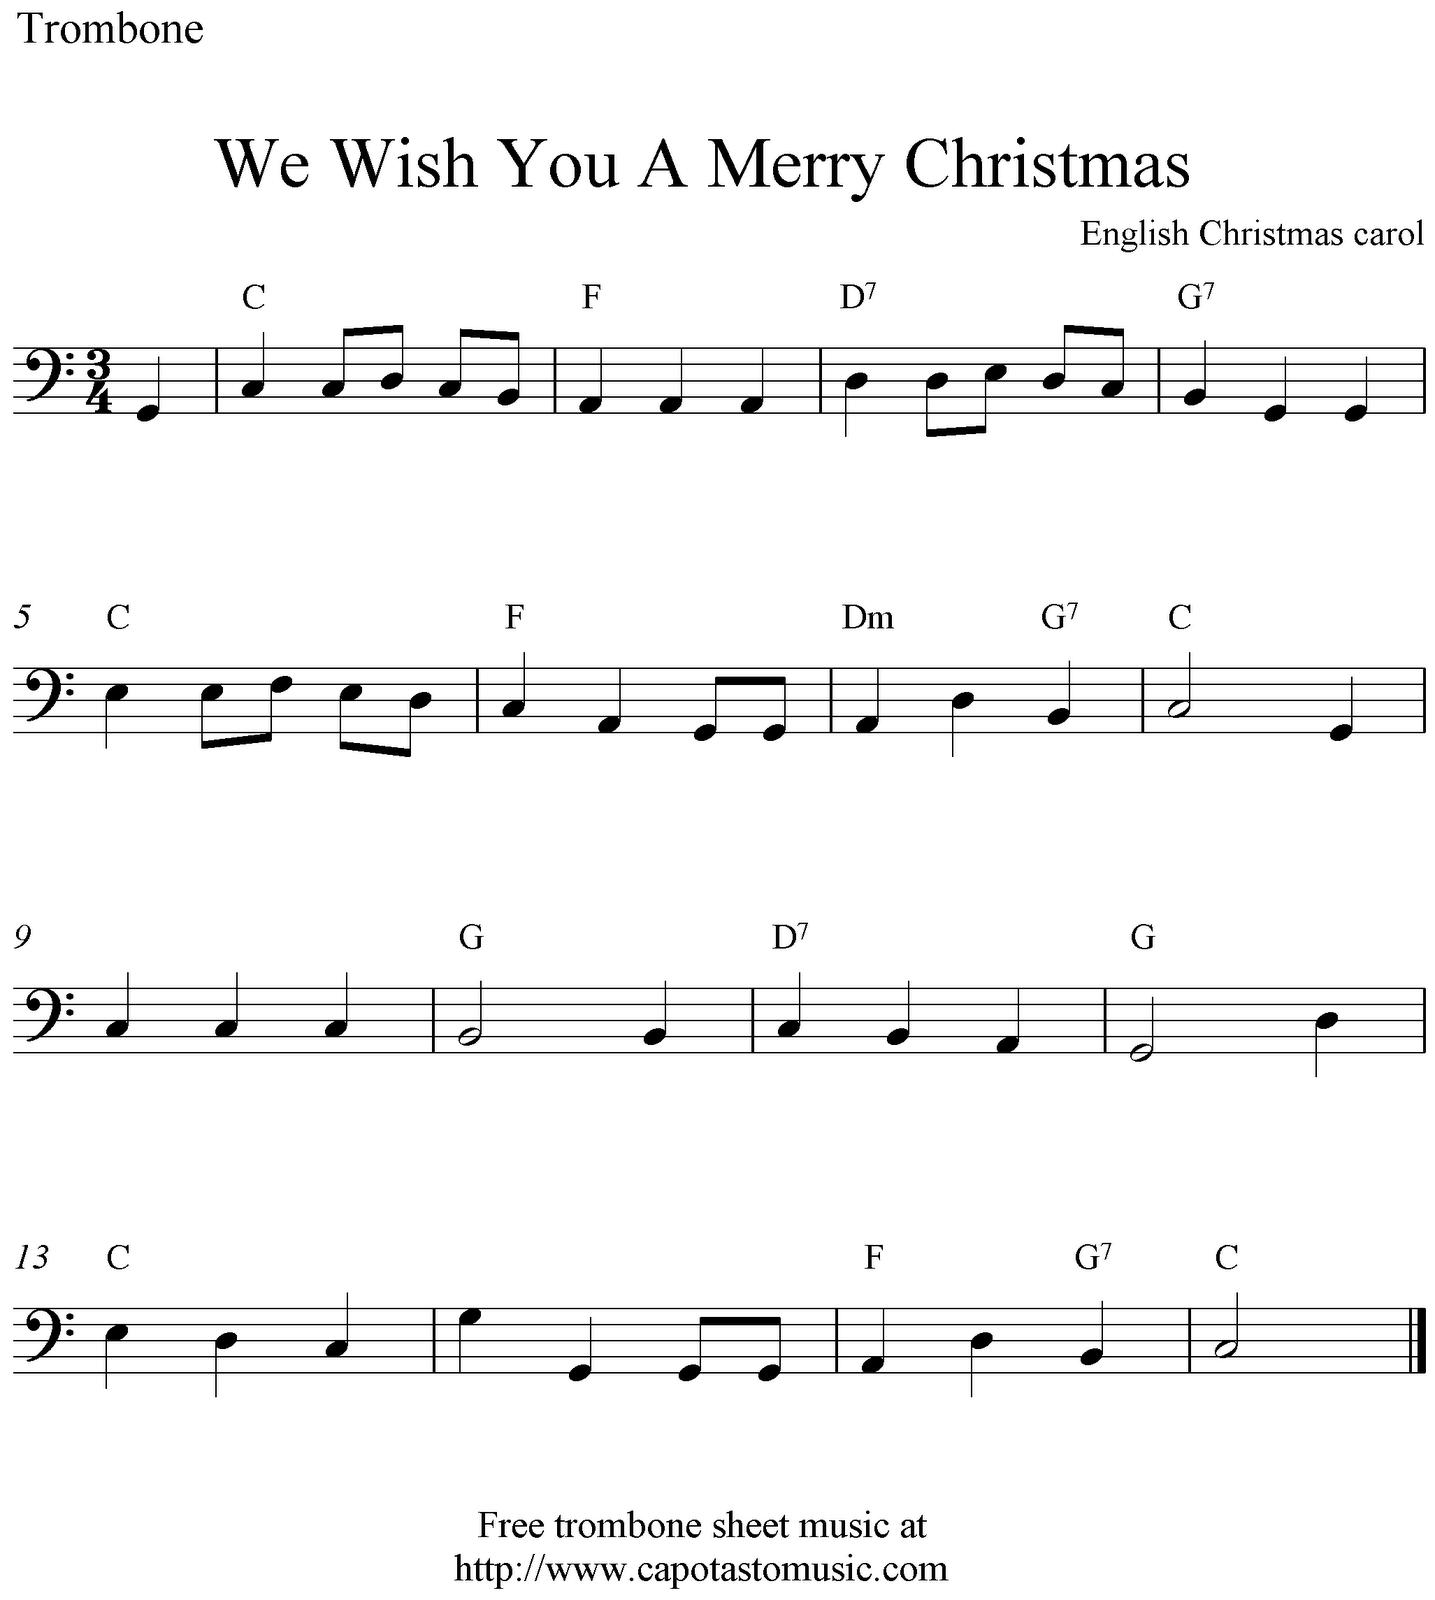 70 Melodious Christmas Piano Sheet Music   Kittybabylove - Free Christmas Sheet Music For Keyboard Printable